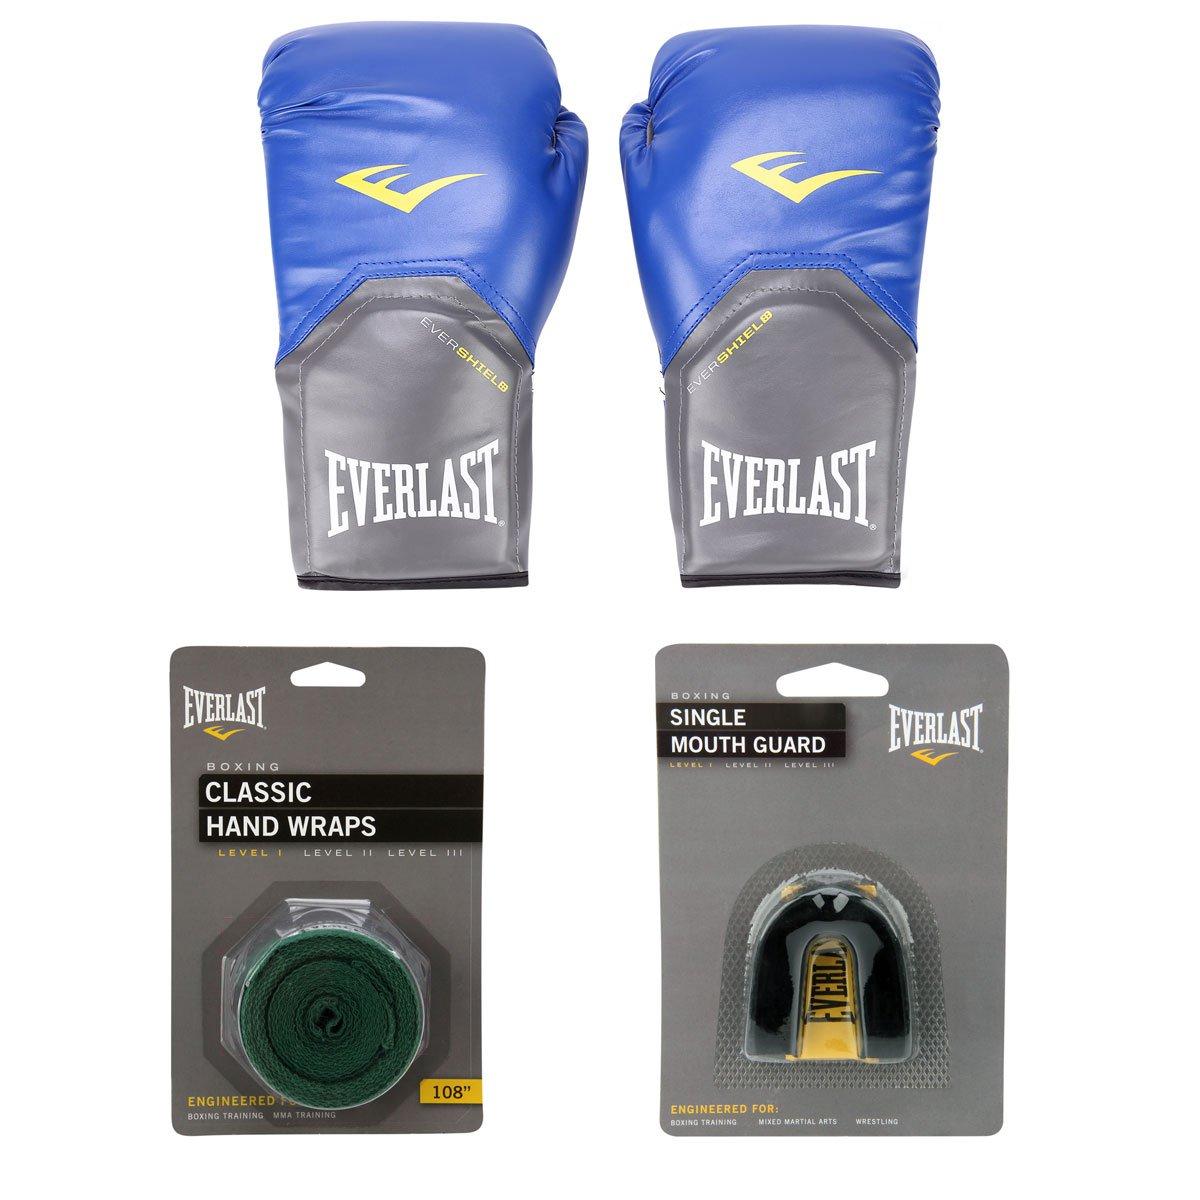 d1626b985c592 Kit Everlast Luva de Boxe Muay Thai Pro Style - 12 oz + Bandagem Elástica +  Protetor Bucal - Compre Agora